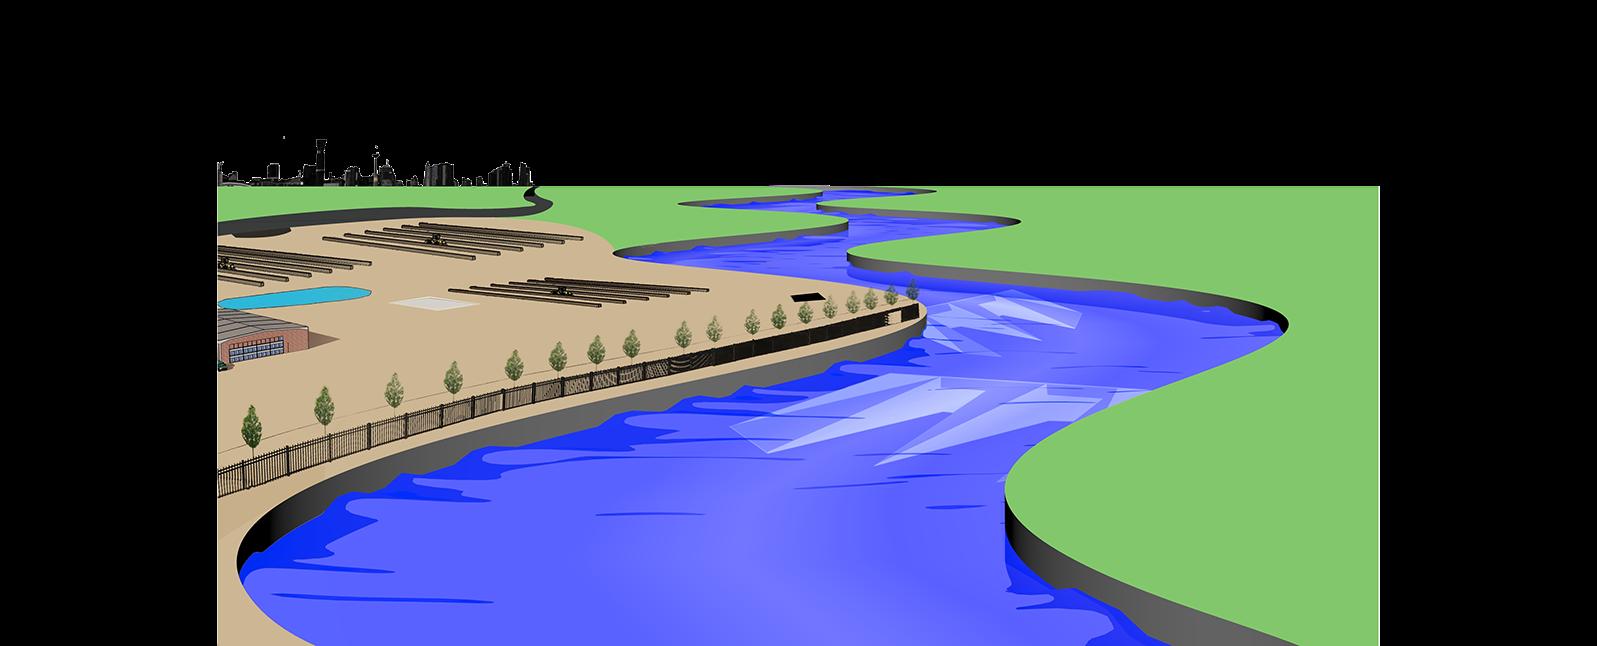 River at getdrawings com. Water clipart scenery